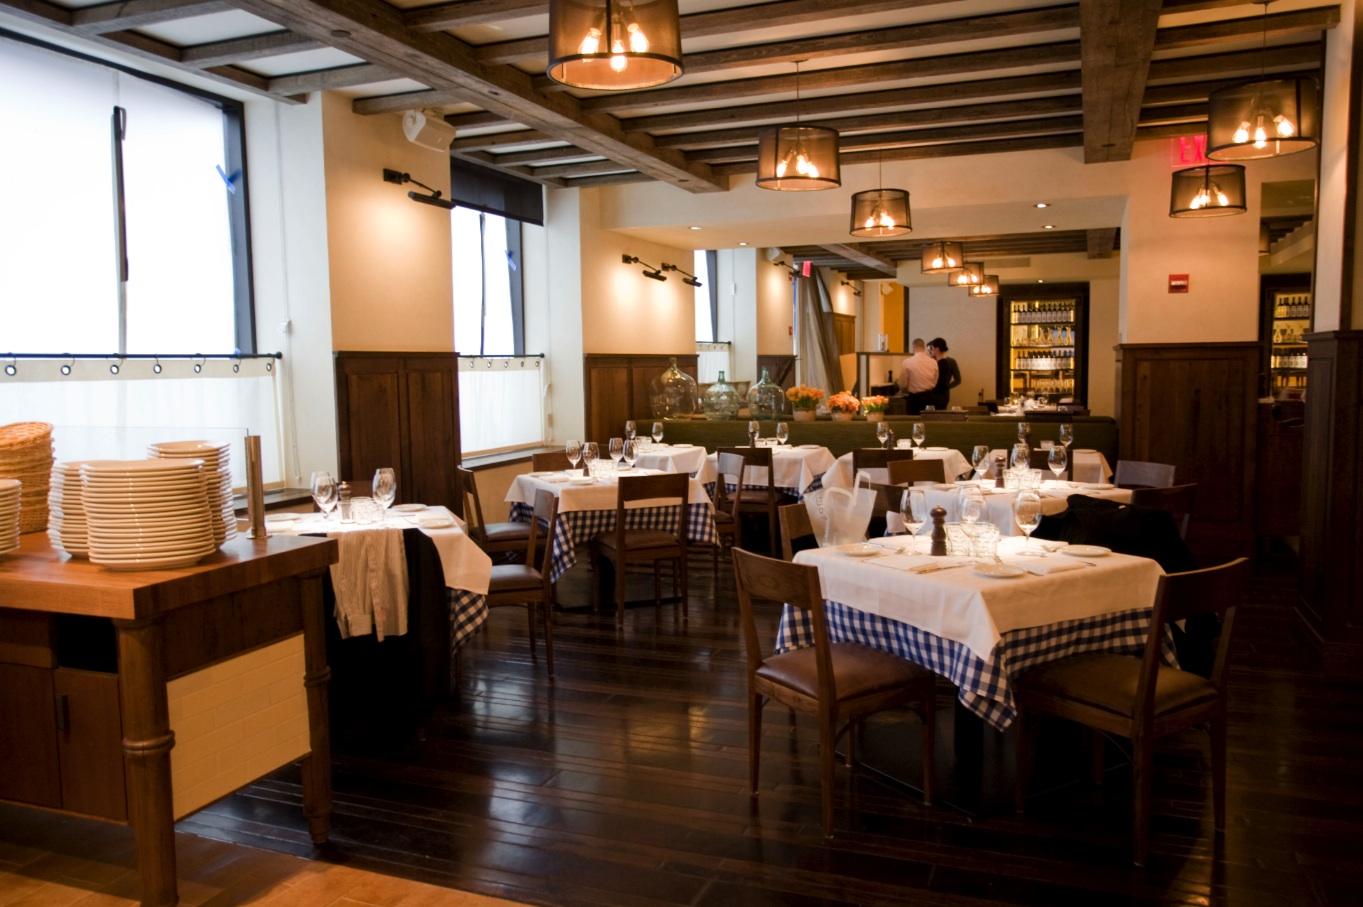 Lombardy Hotel Nyc Restaurant